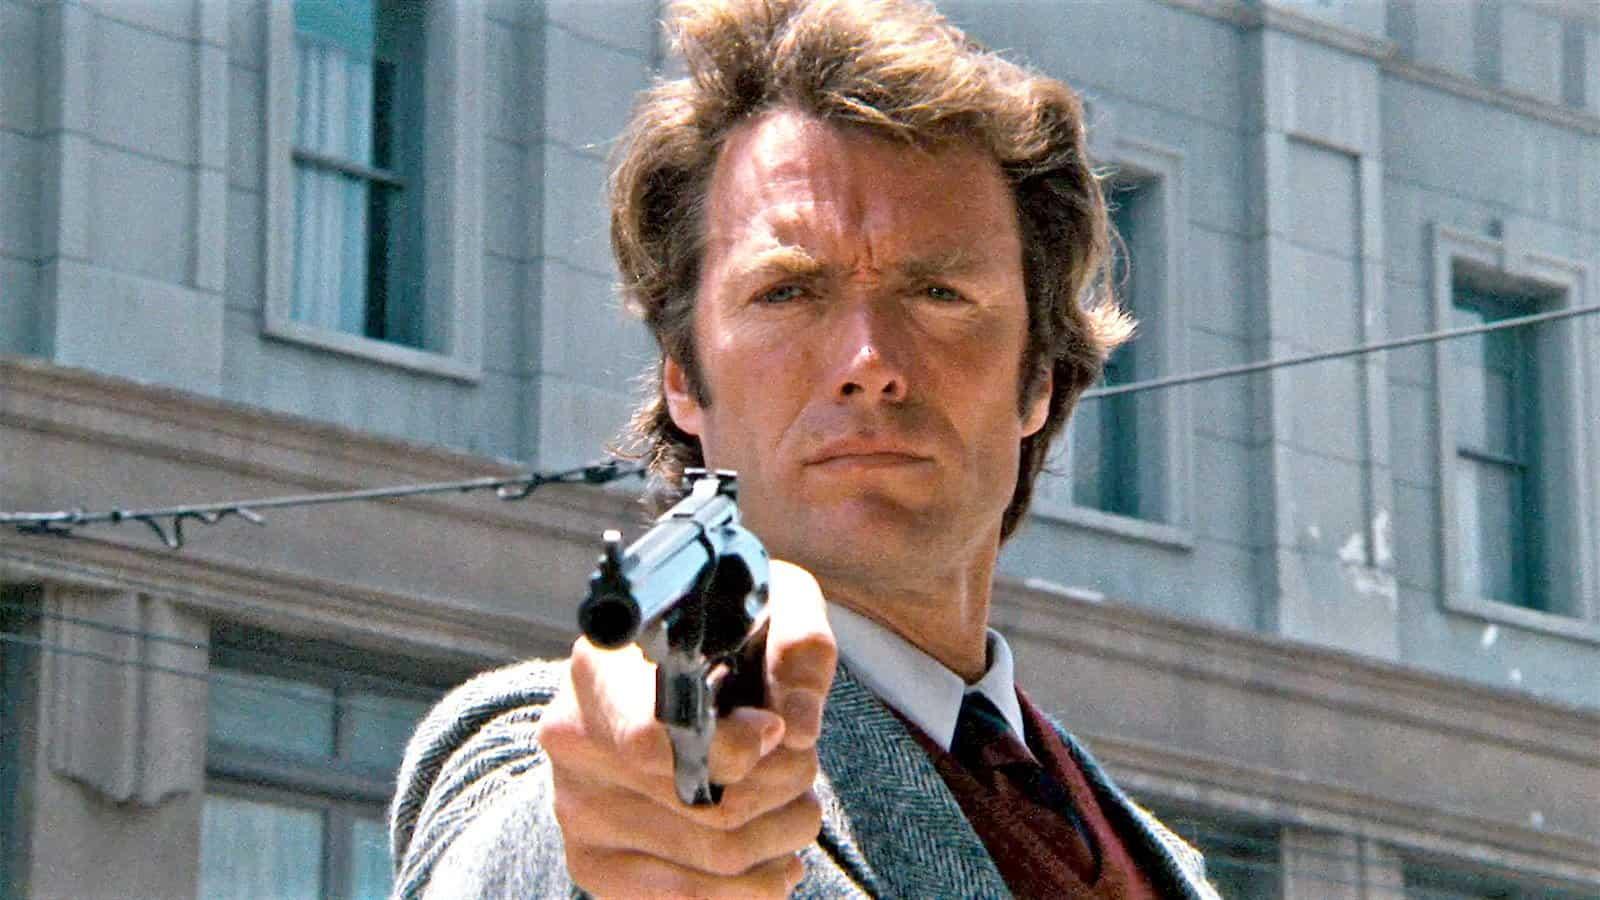 Clint Eastwood i Dirty Harry från 1971.